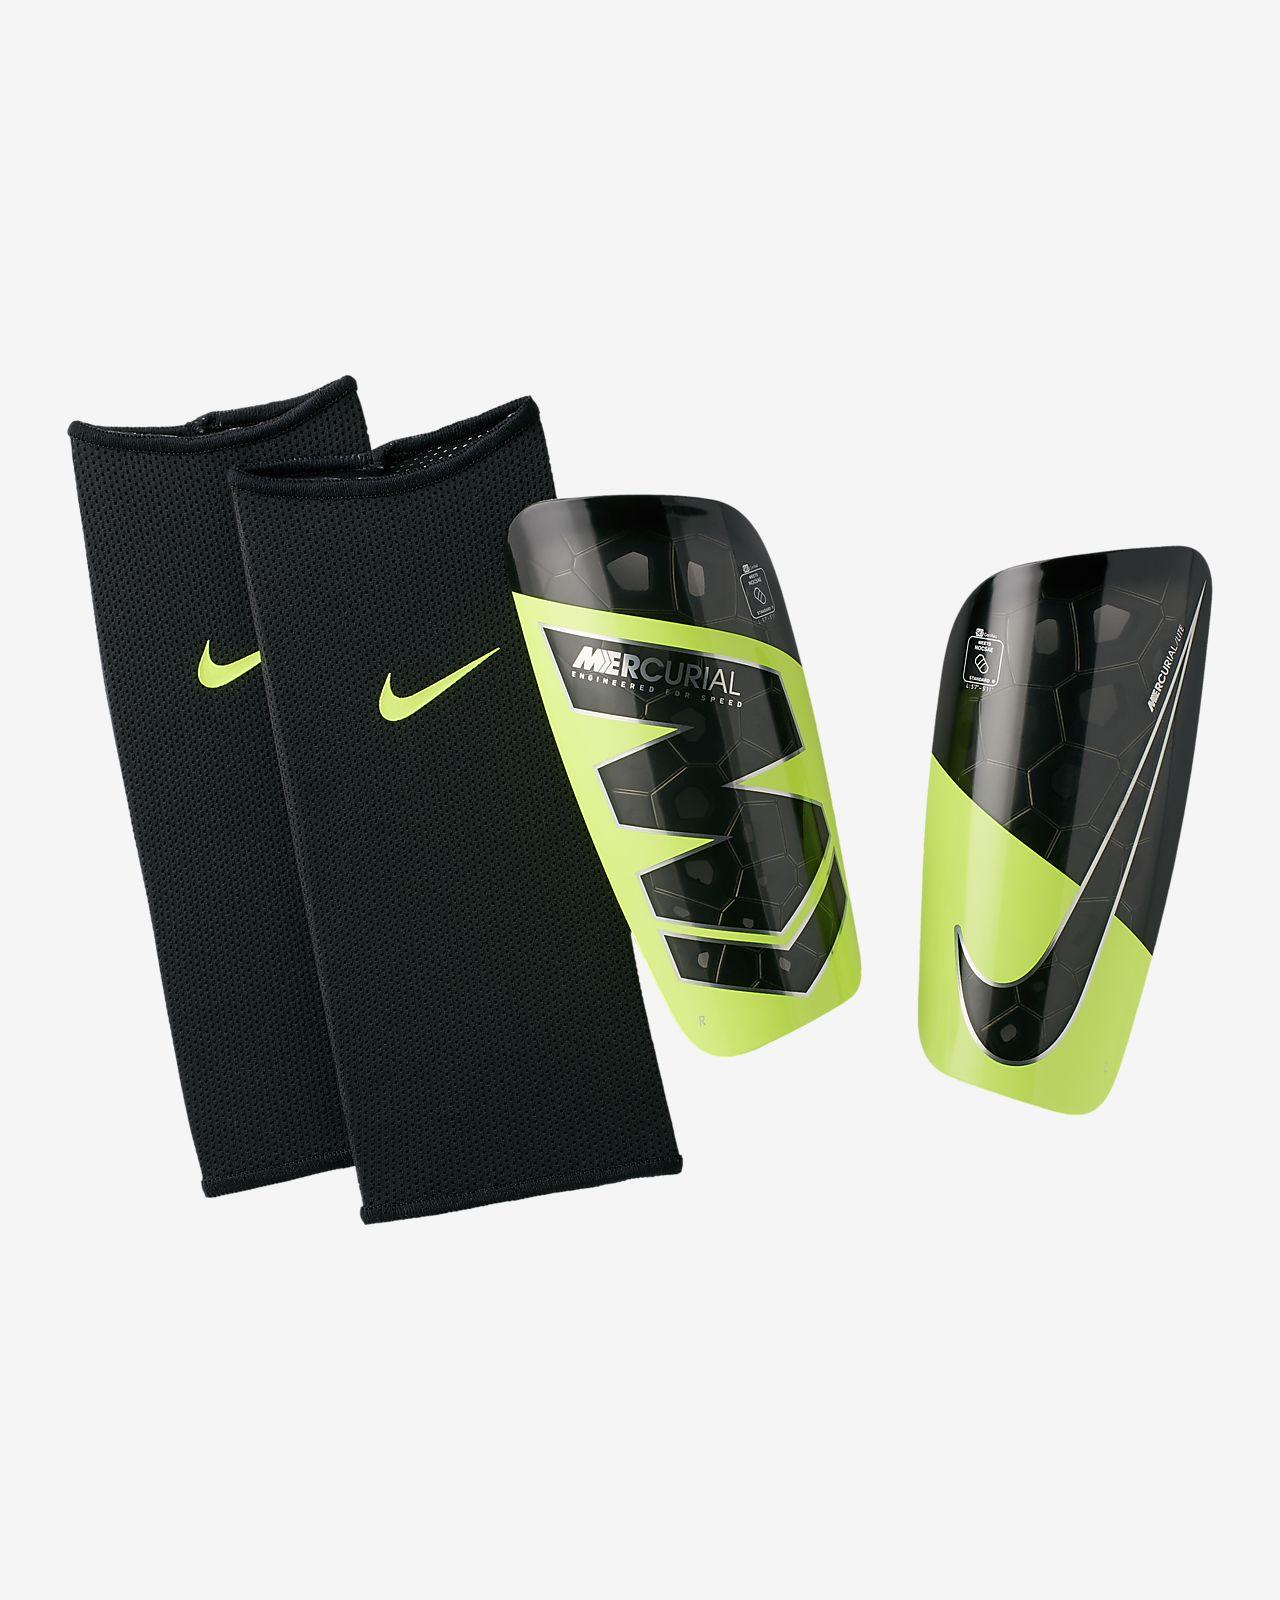 c97afb661d2 Protège-tibias de football Nike Mercurial Lite. Nike.com CA